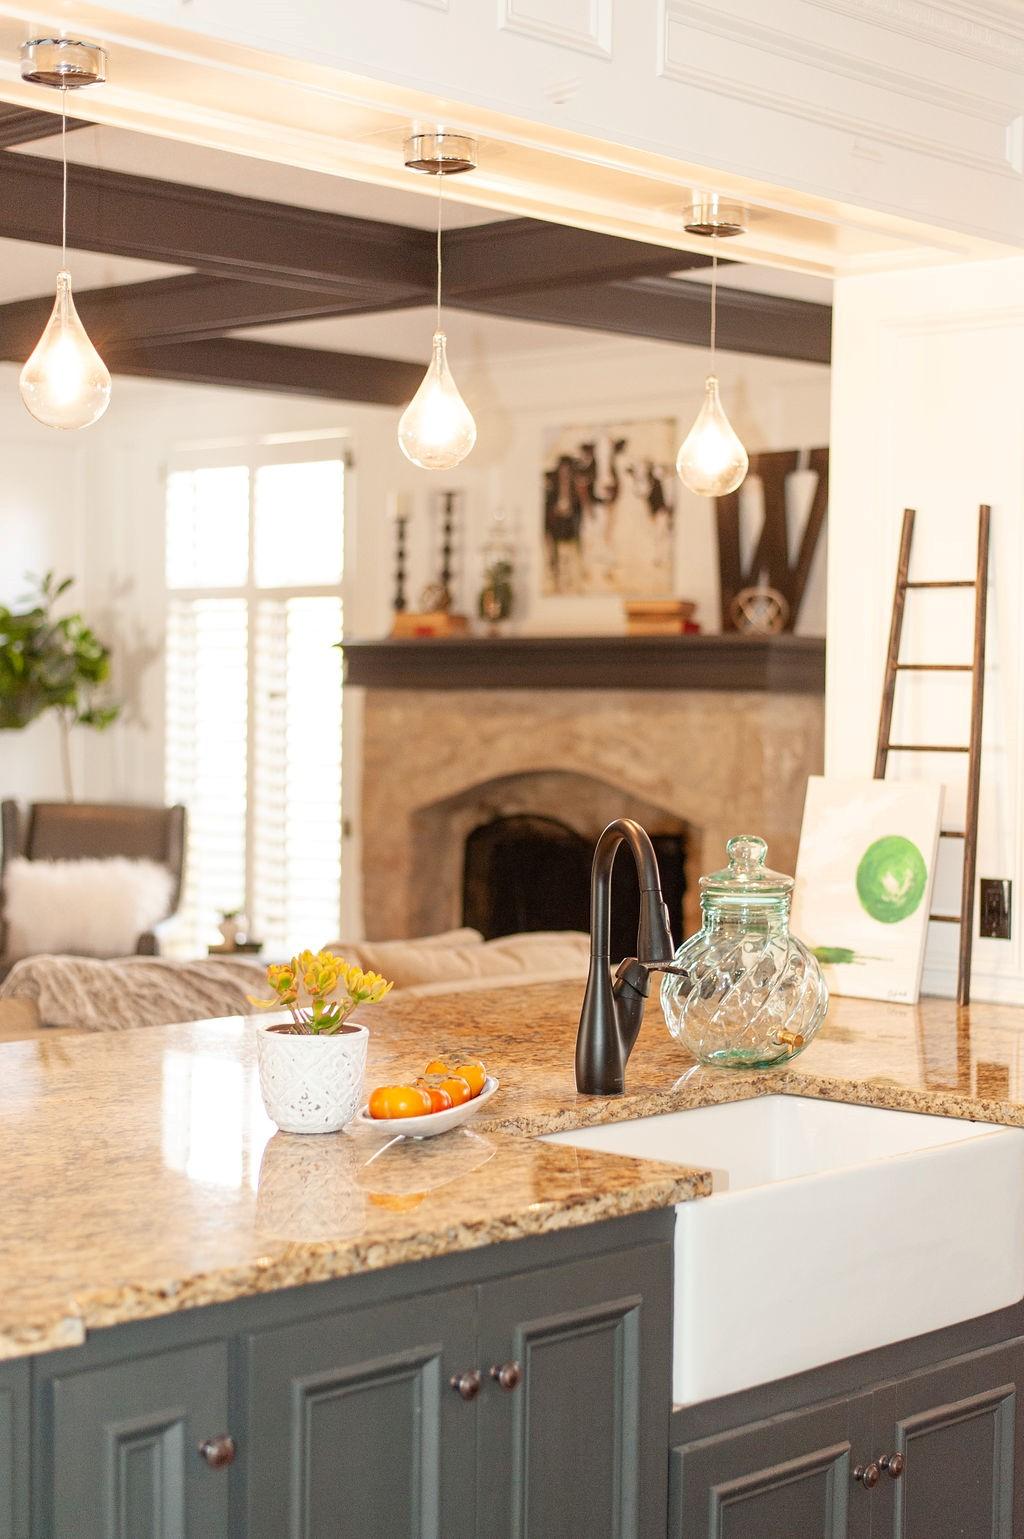 Blank-Canvas-Interior-Design-in-kansas-city-kitchen-Island-Lighting.jpg